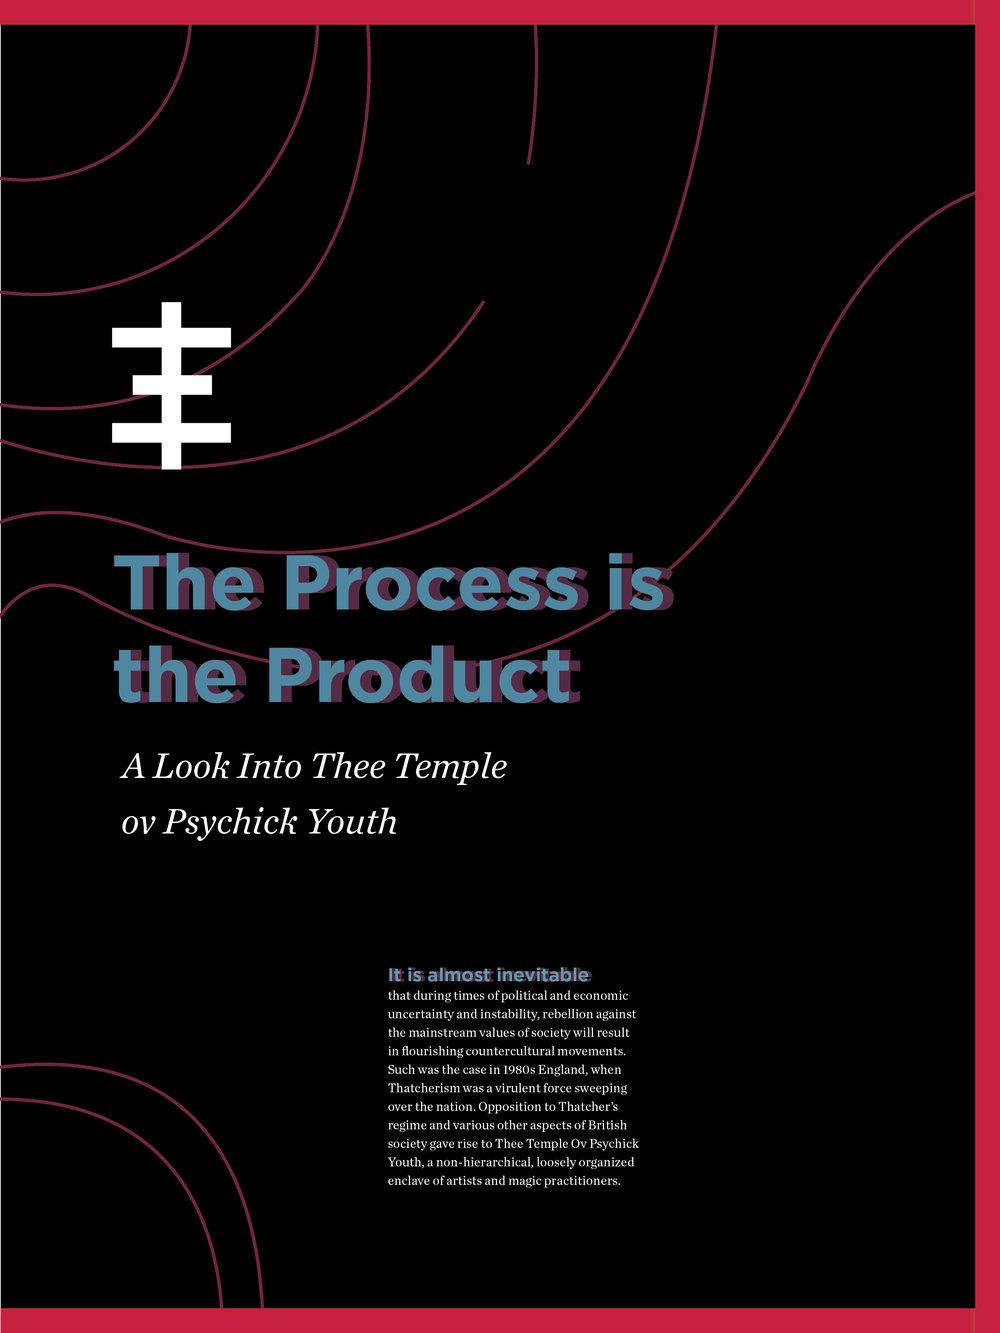 process-product-01.jpg